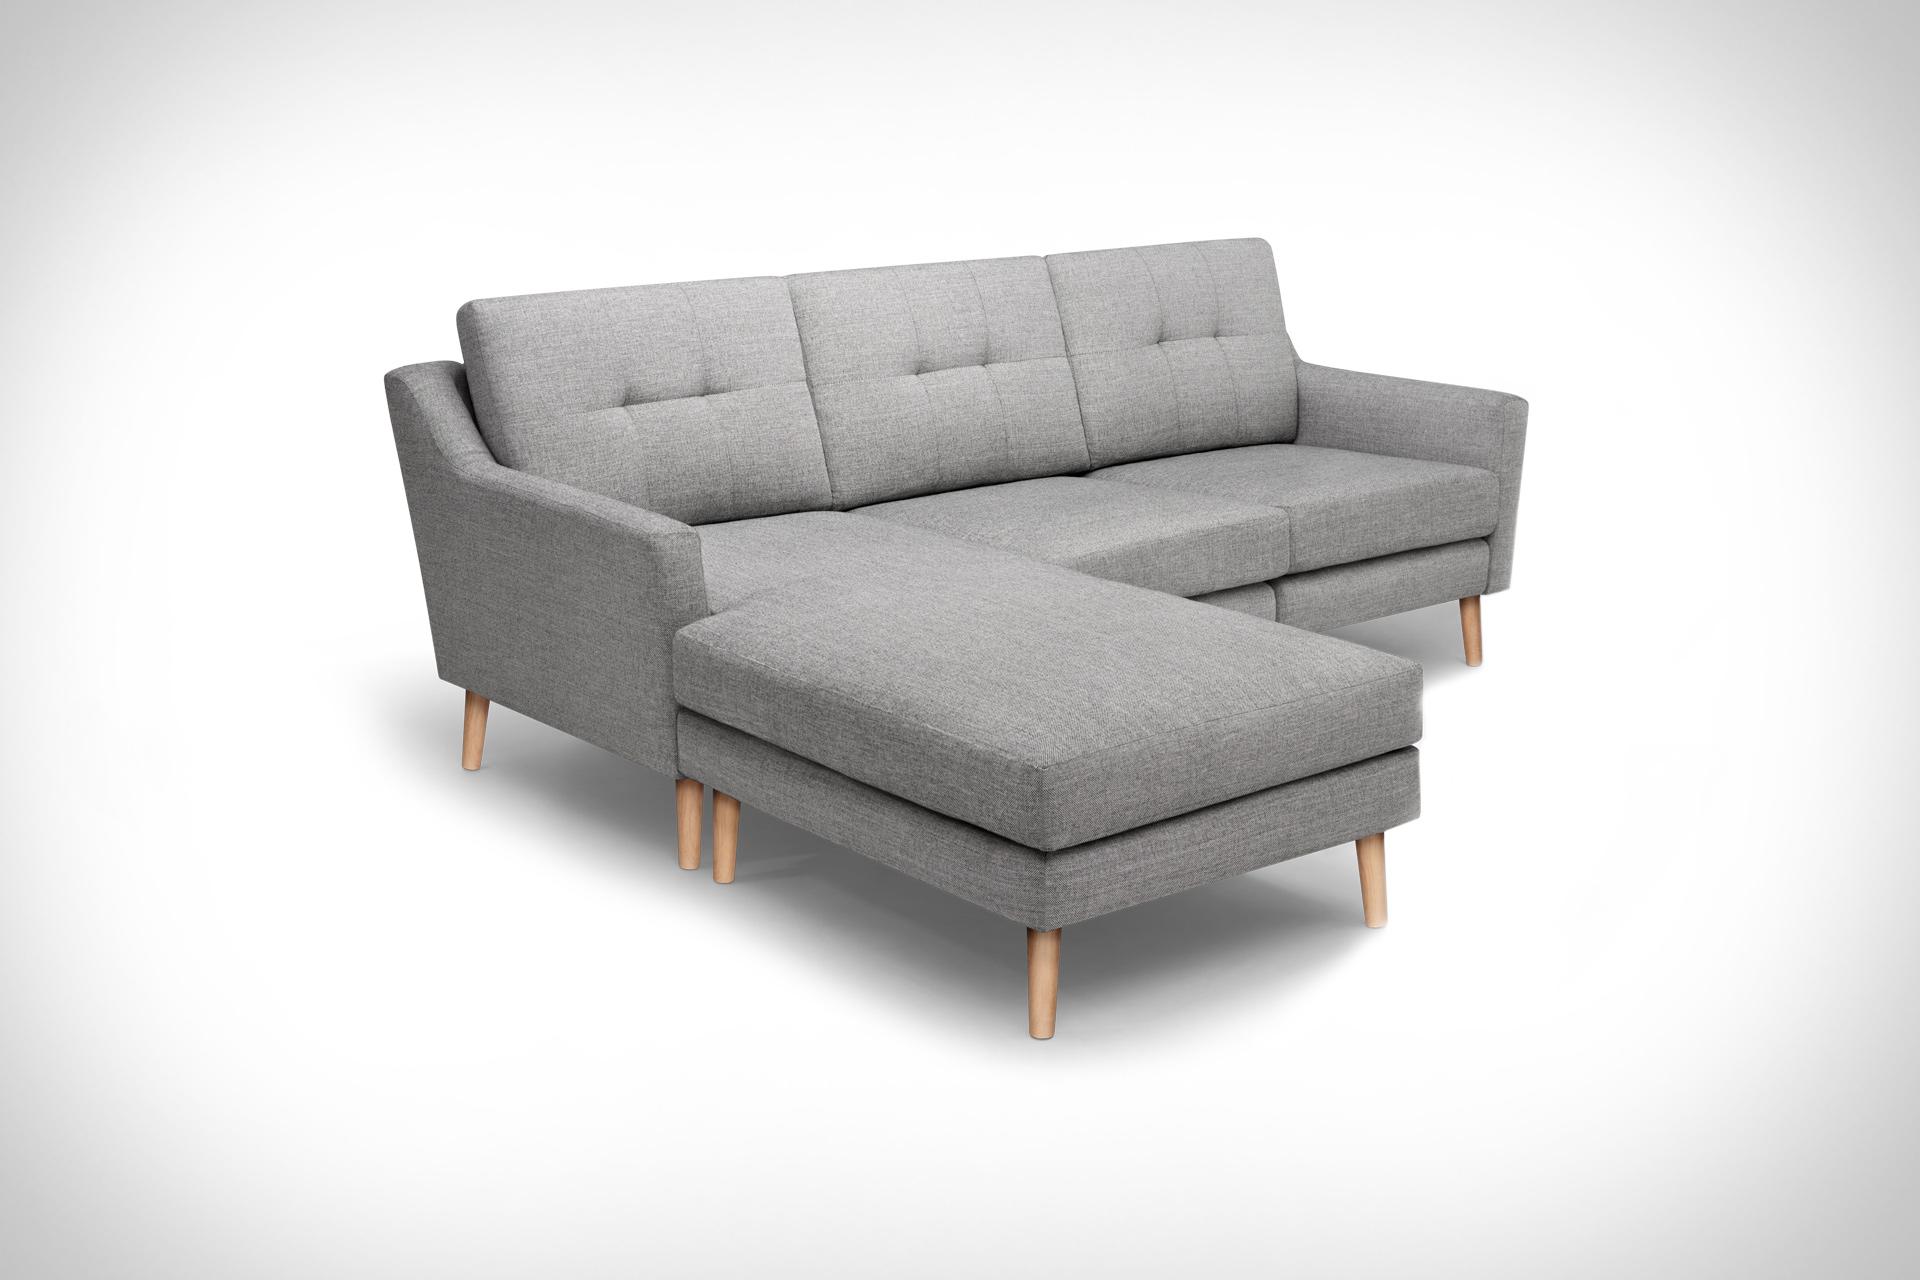 Burrow Modular Sofa Uncrate